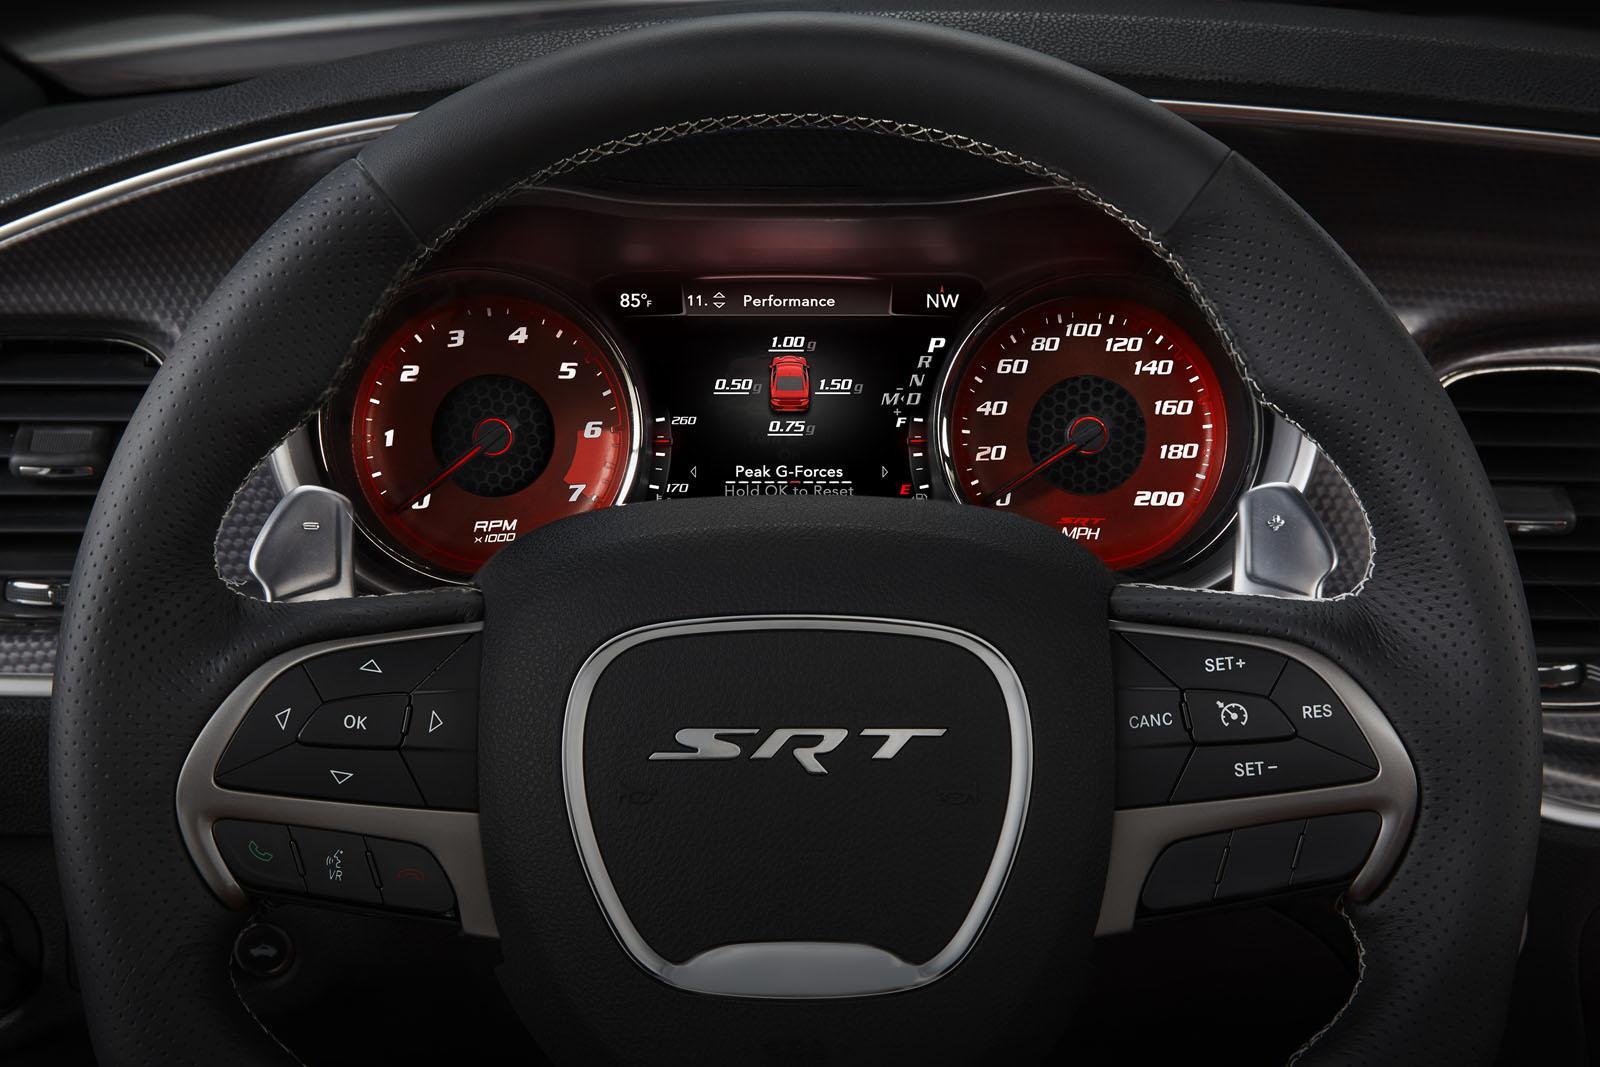 Dodge Charger Srt Hellcat G Force Indicator on 2014 Dodge Durango Specs